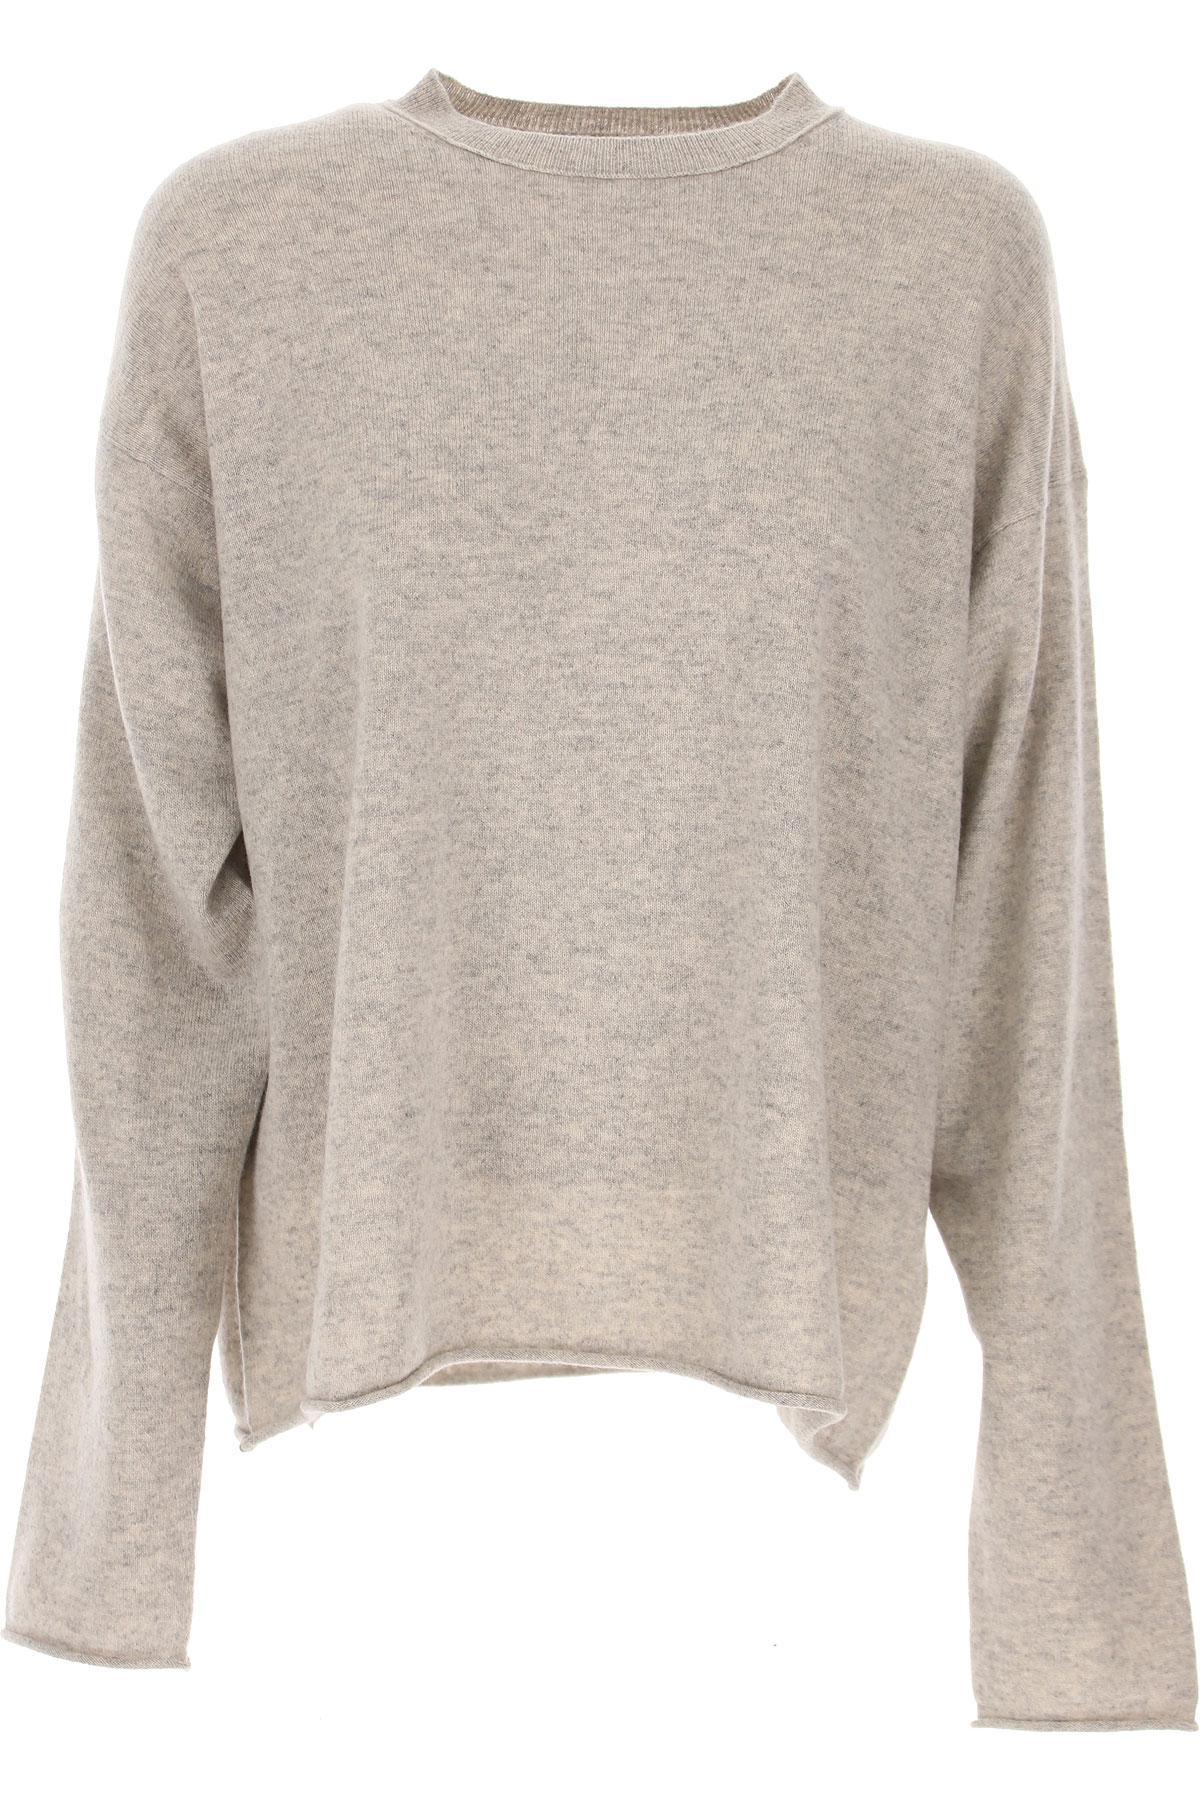 Sofie dHoore Sweater for Women Jumper On Sale, Silver Melange, Cashemere, 2019, 4 6